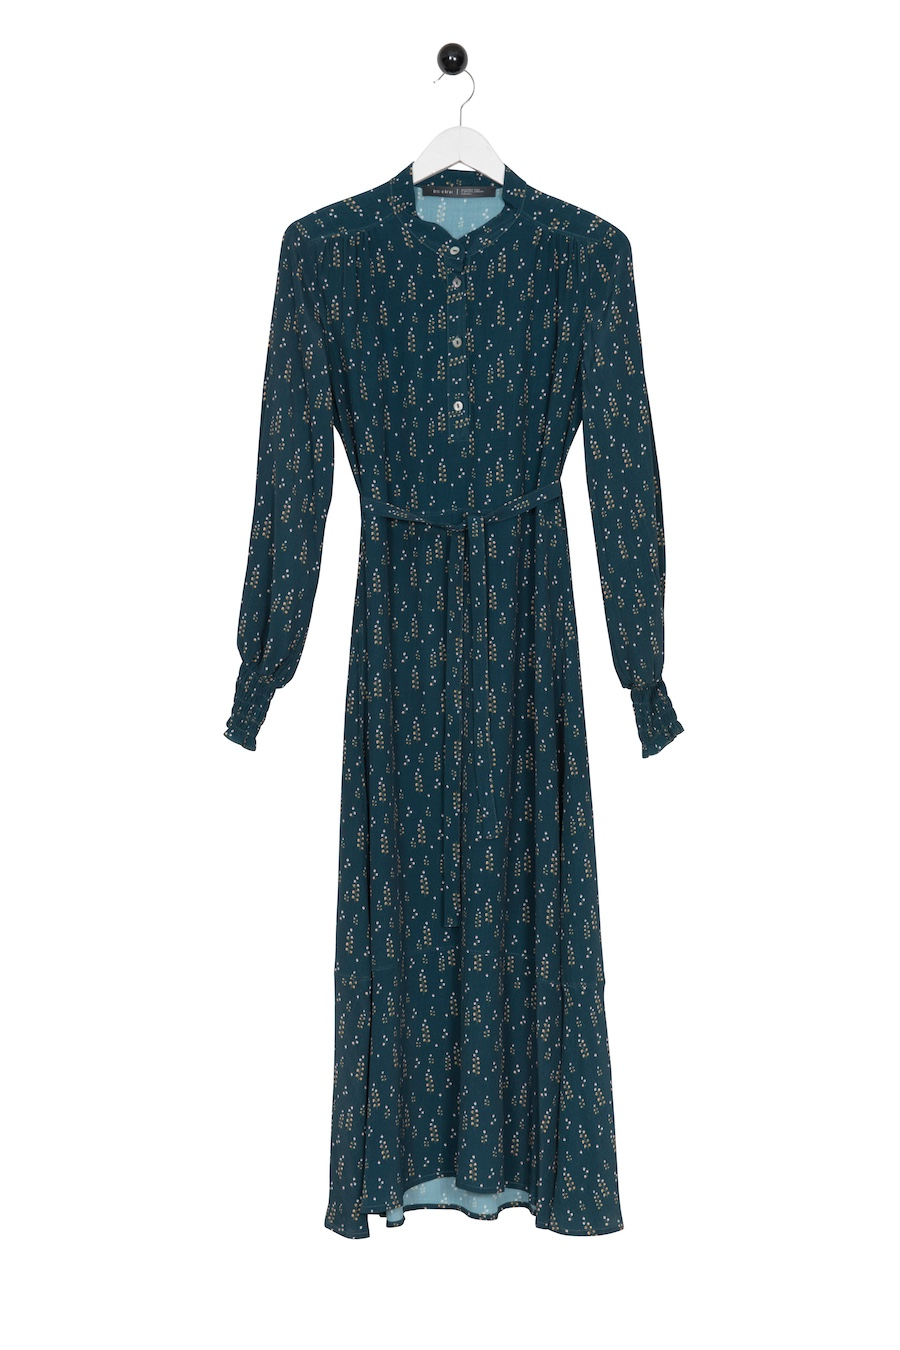 Garrano Dress